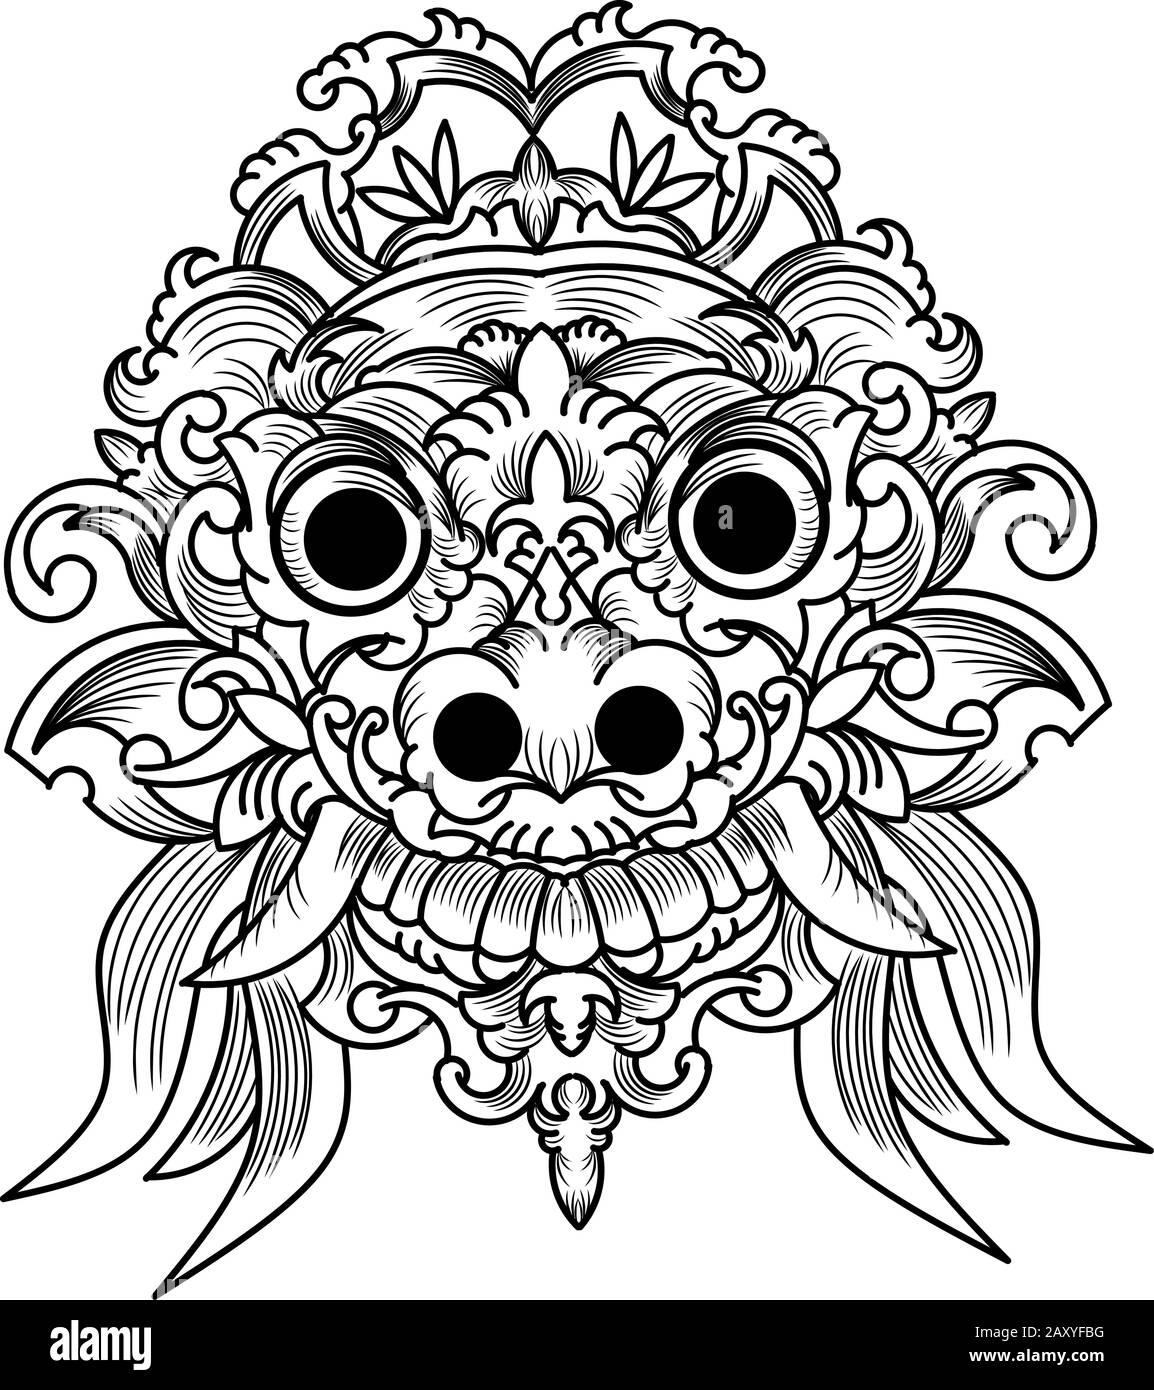 Batik Sunda Vector : batik, sunda, vector, Batik, Black, White, Stock, Photos, Images, Alamy